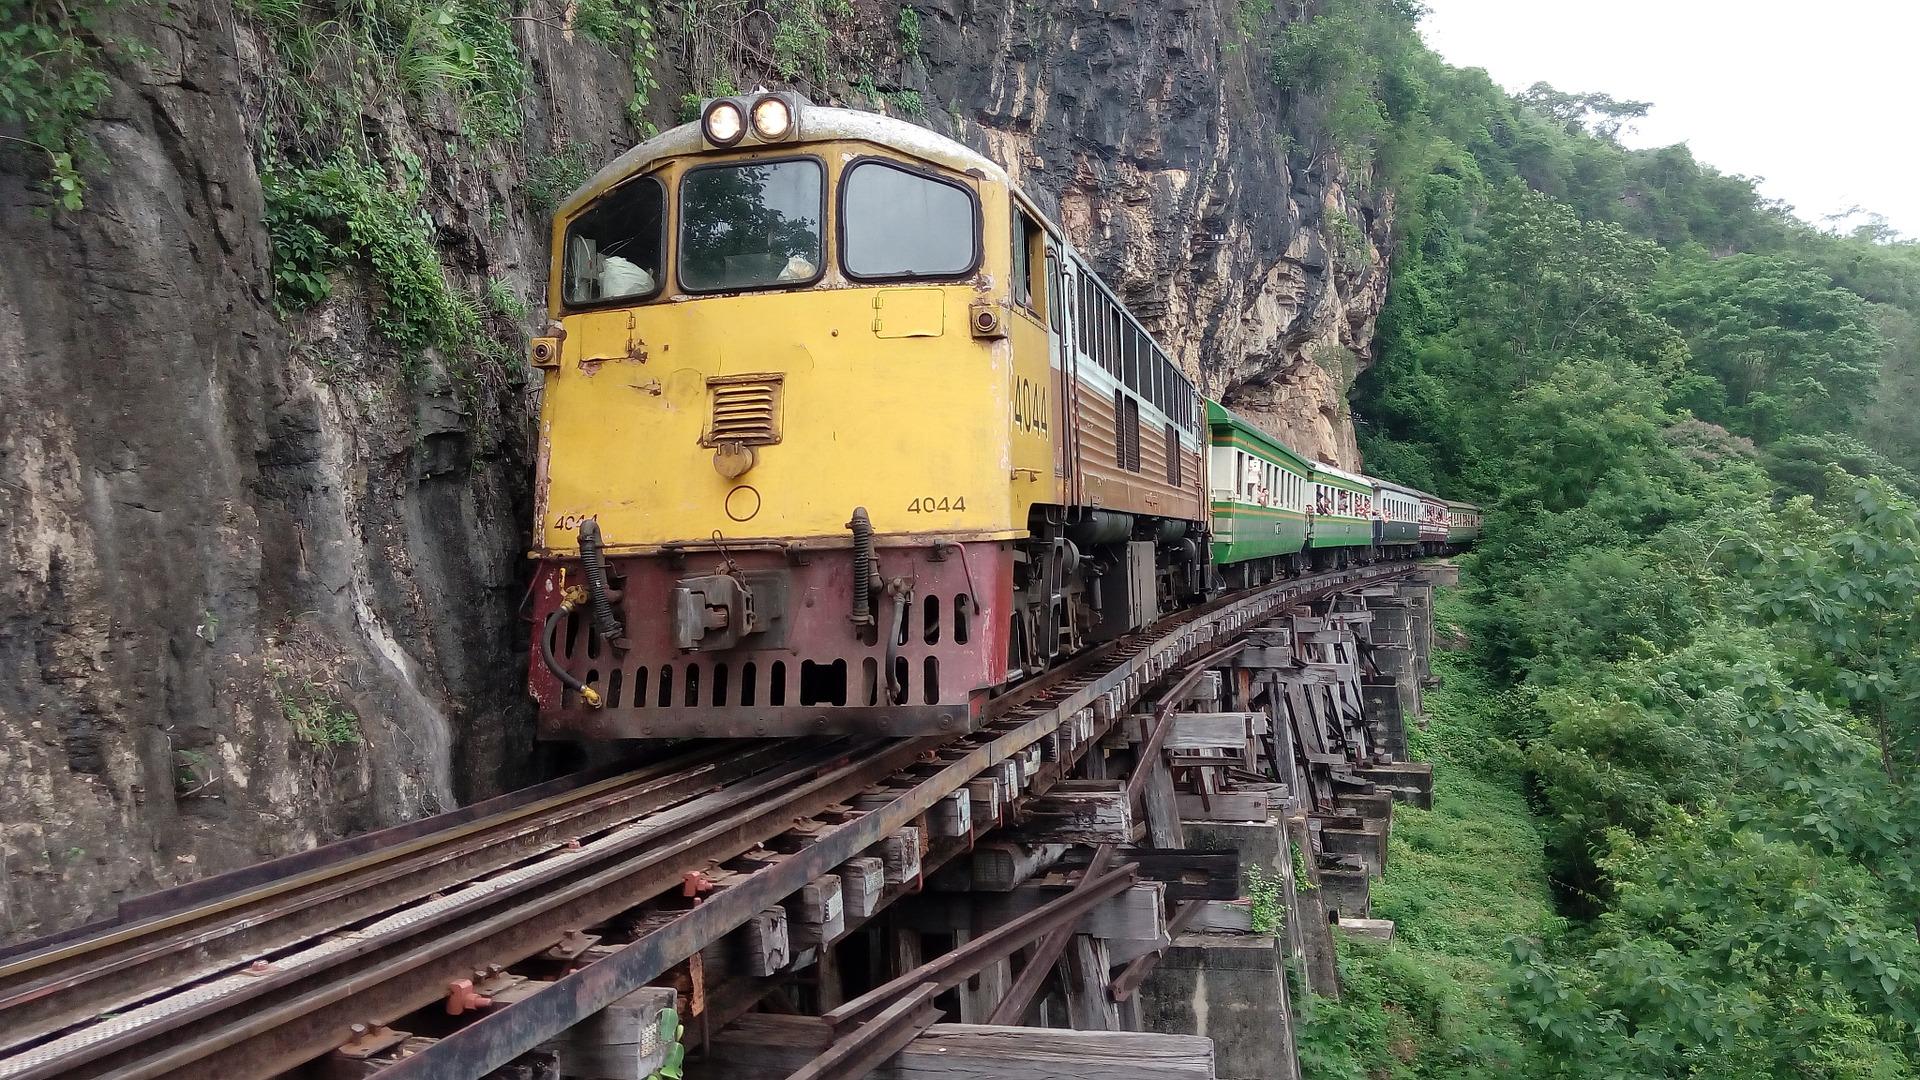 train-861407_1920.jpg